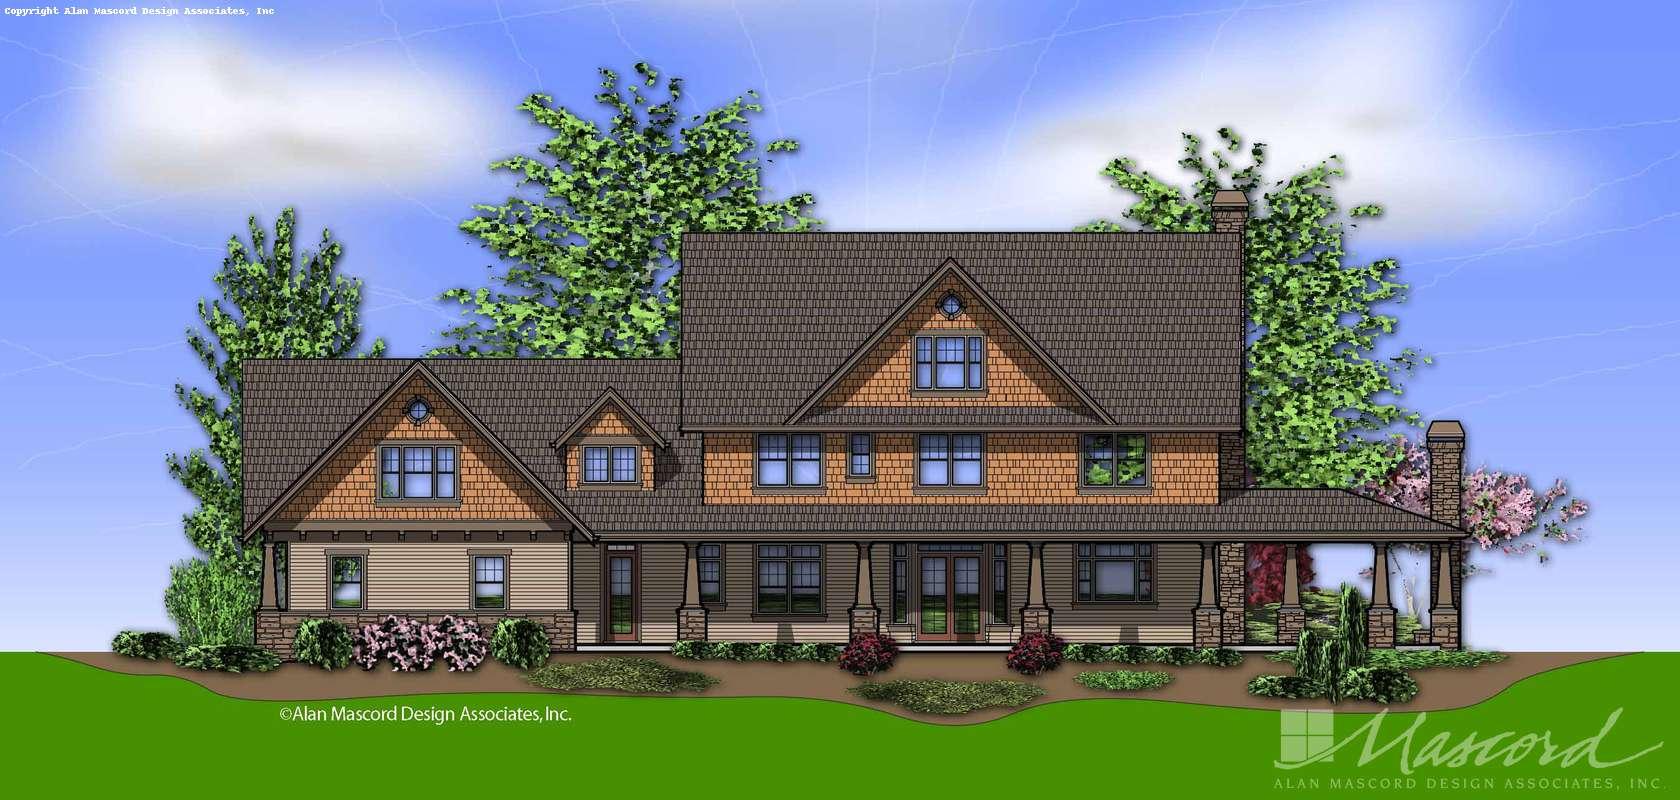 Mascord House Plan 2386: The Vicksburg